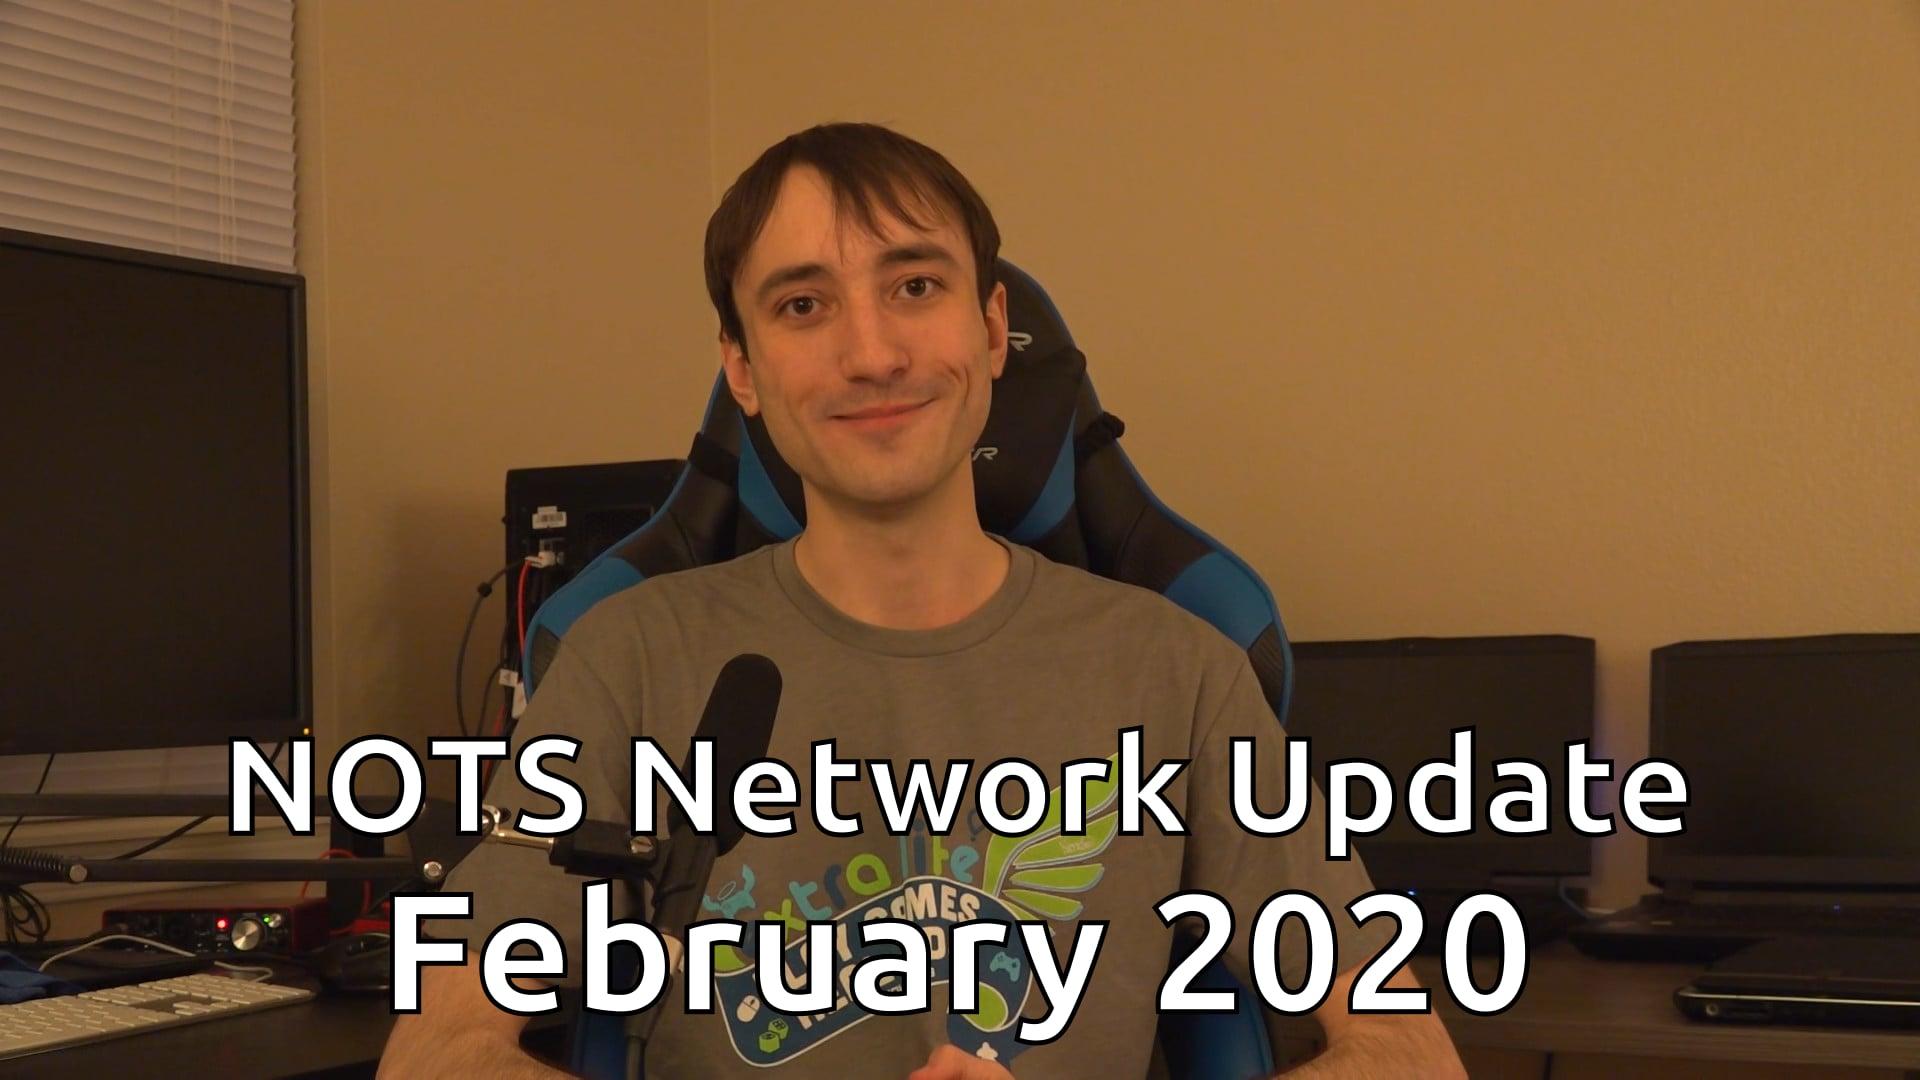 NOTS Network Update - February 2020